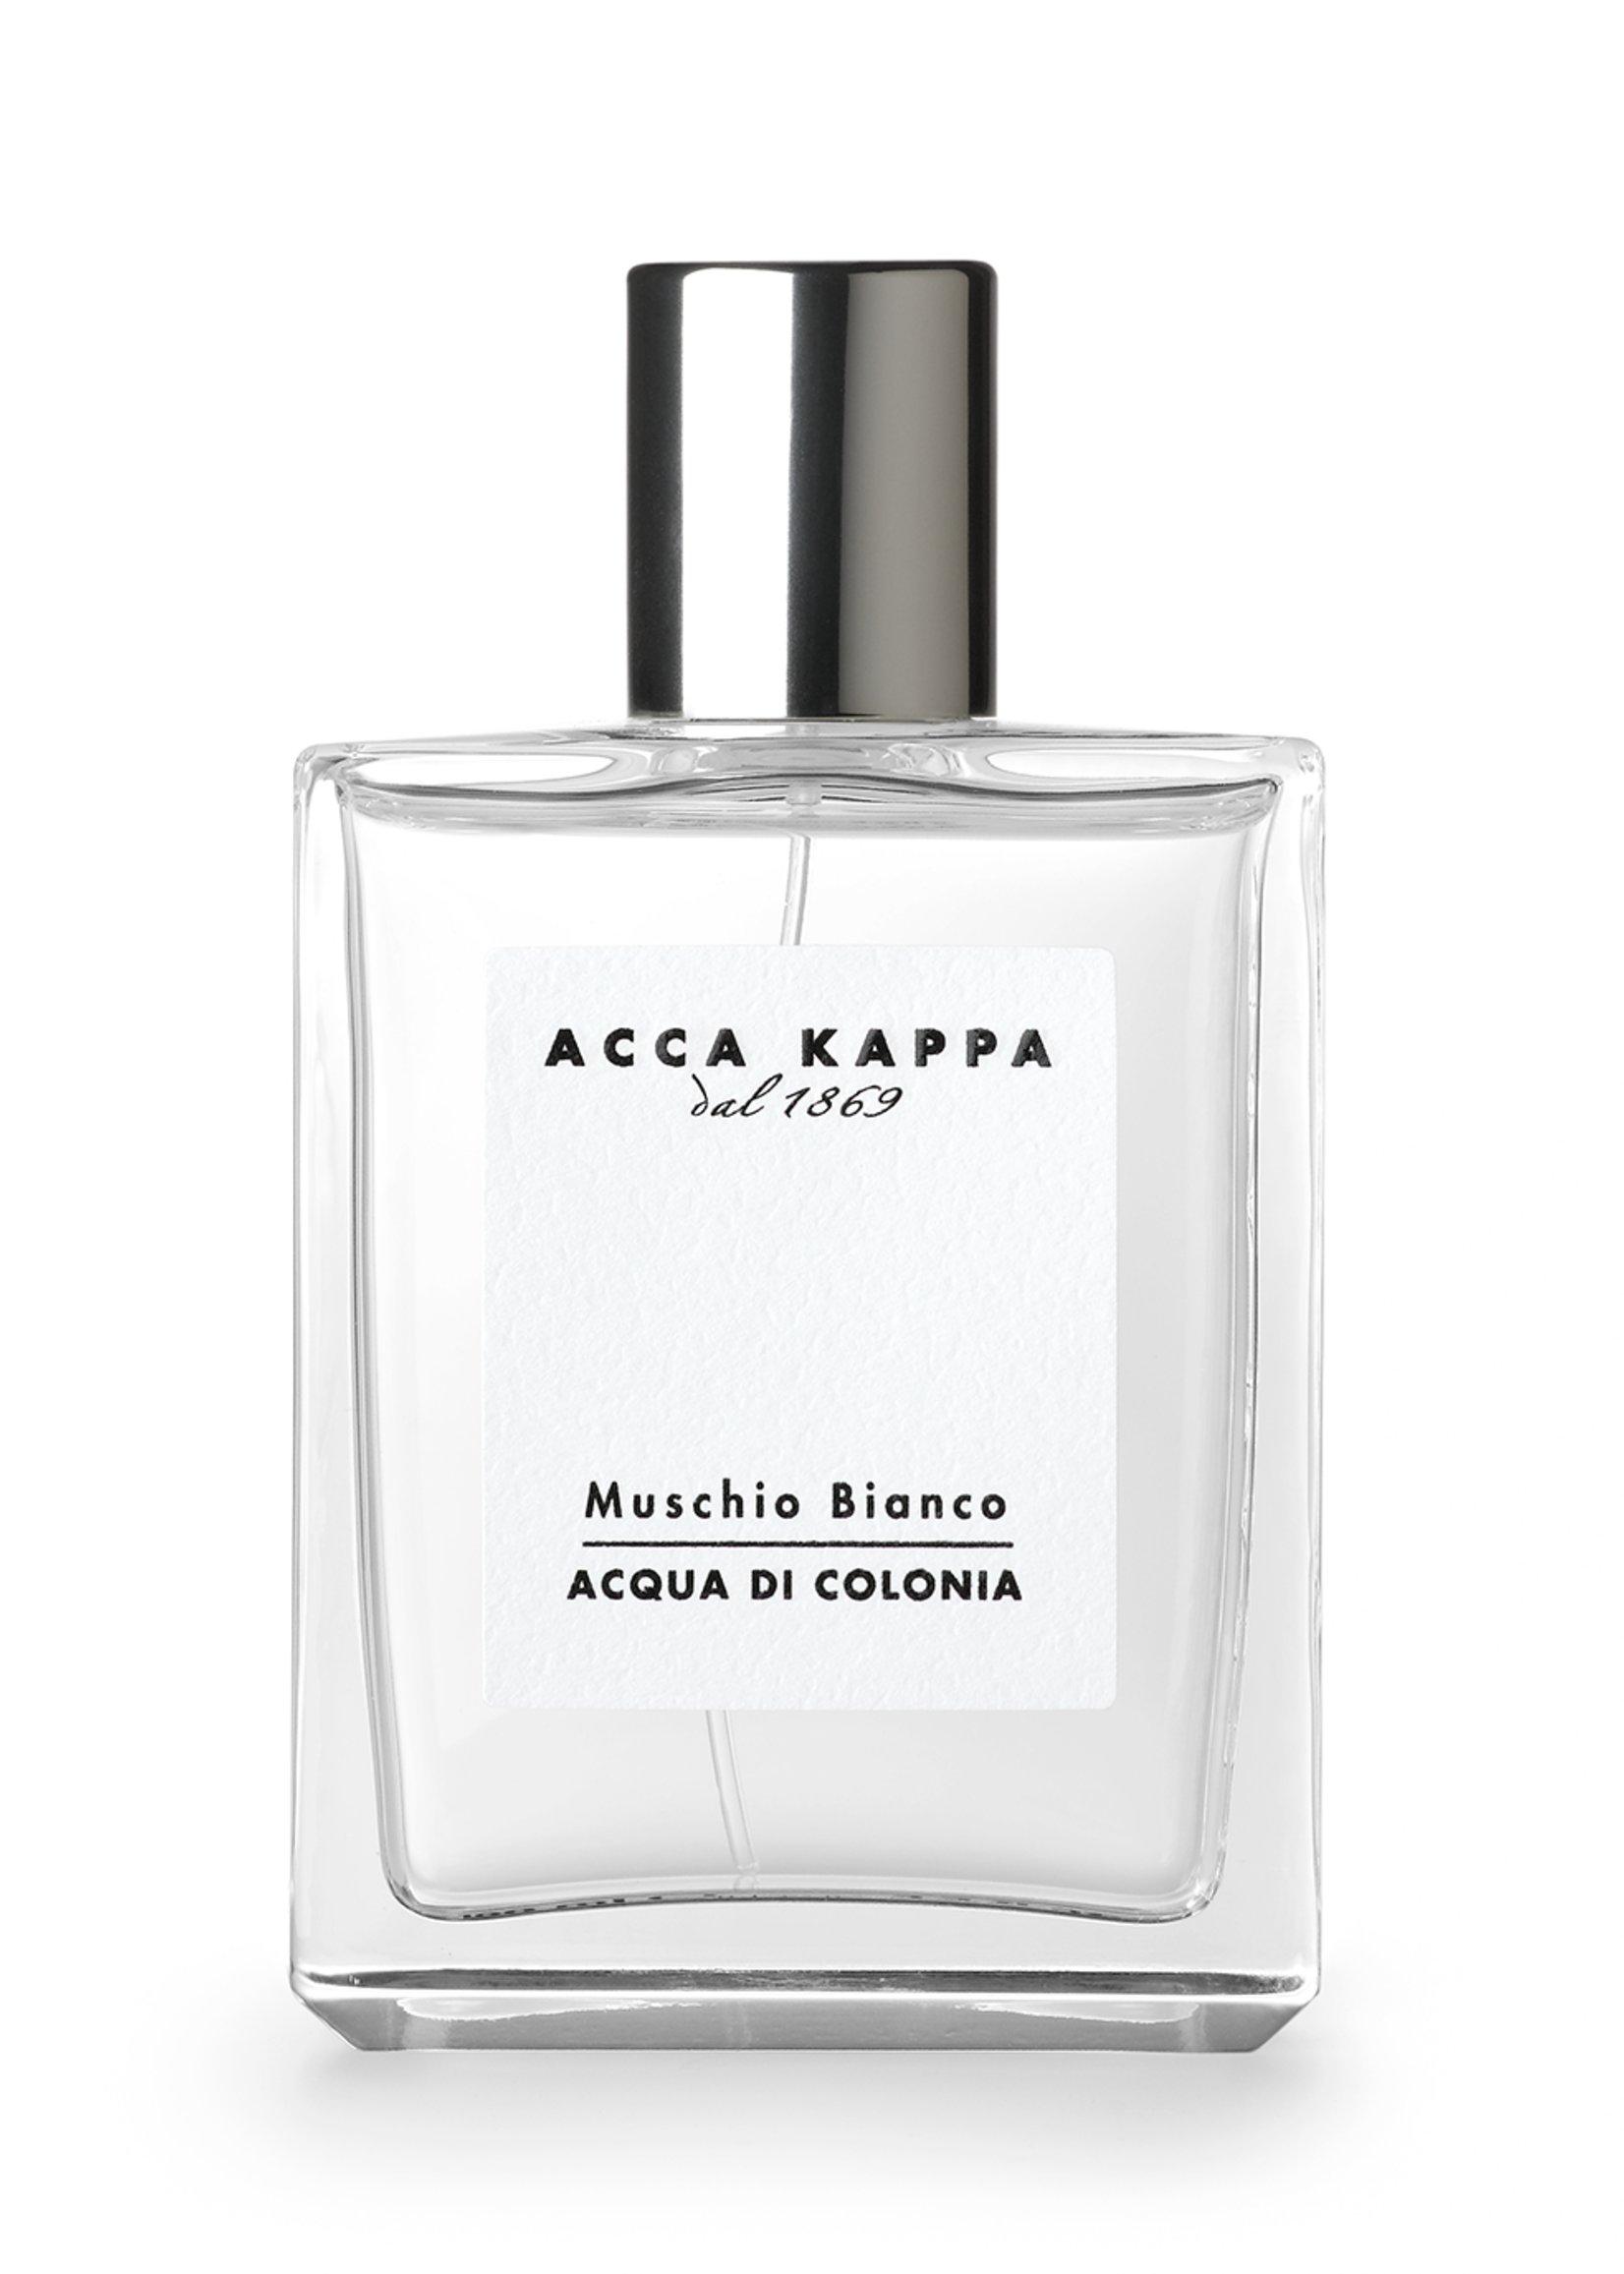 Acca Kappa Cologne Muschio Bianco by Acca Kappa